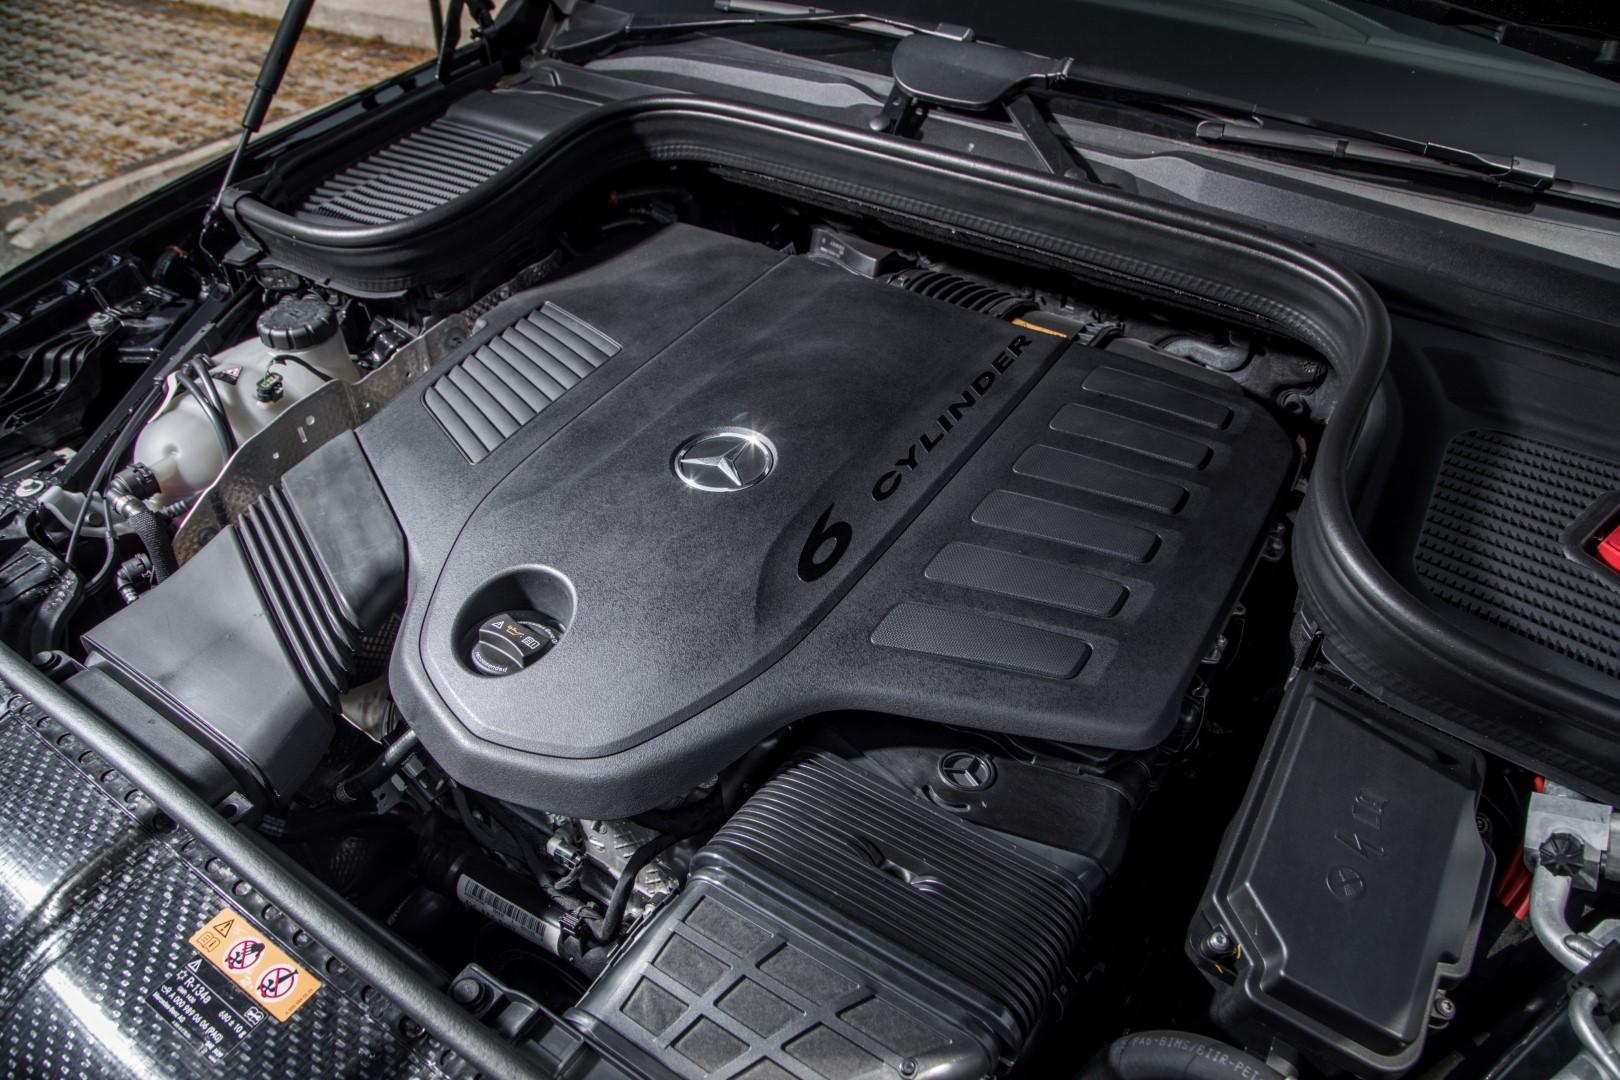 mercedes-benz gle 450 engine